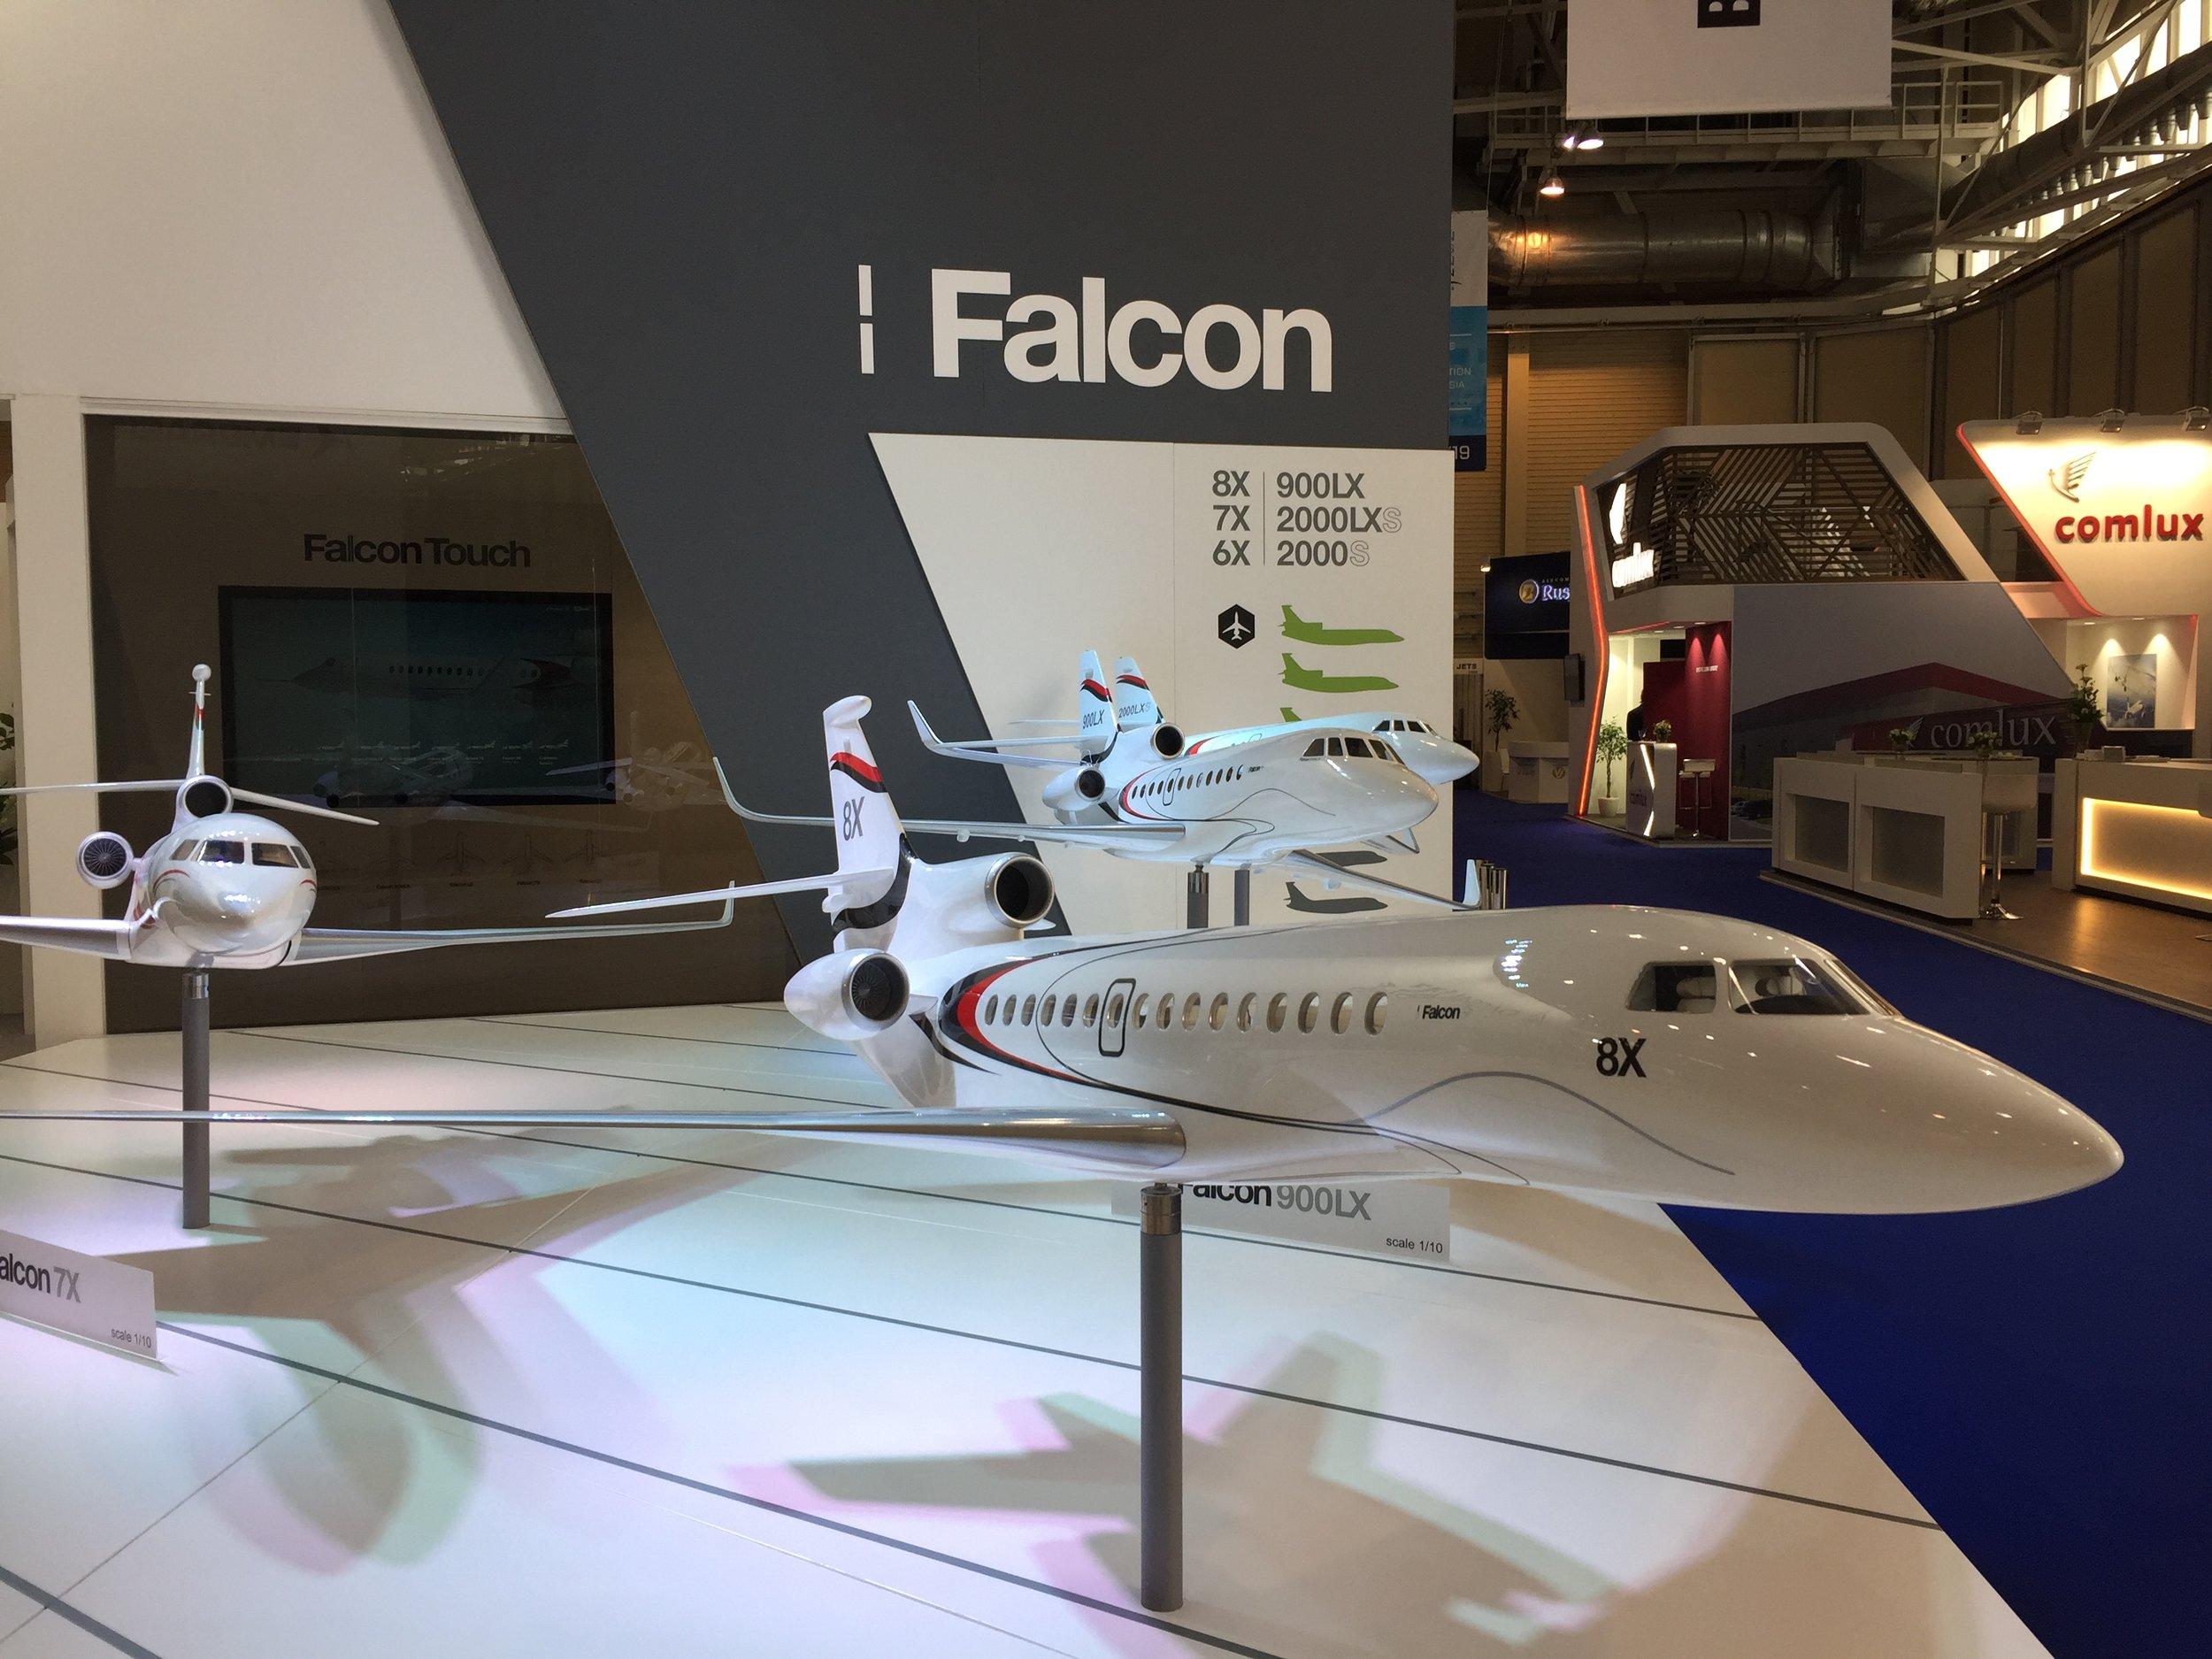 The Dassault Falcon executive jet family